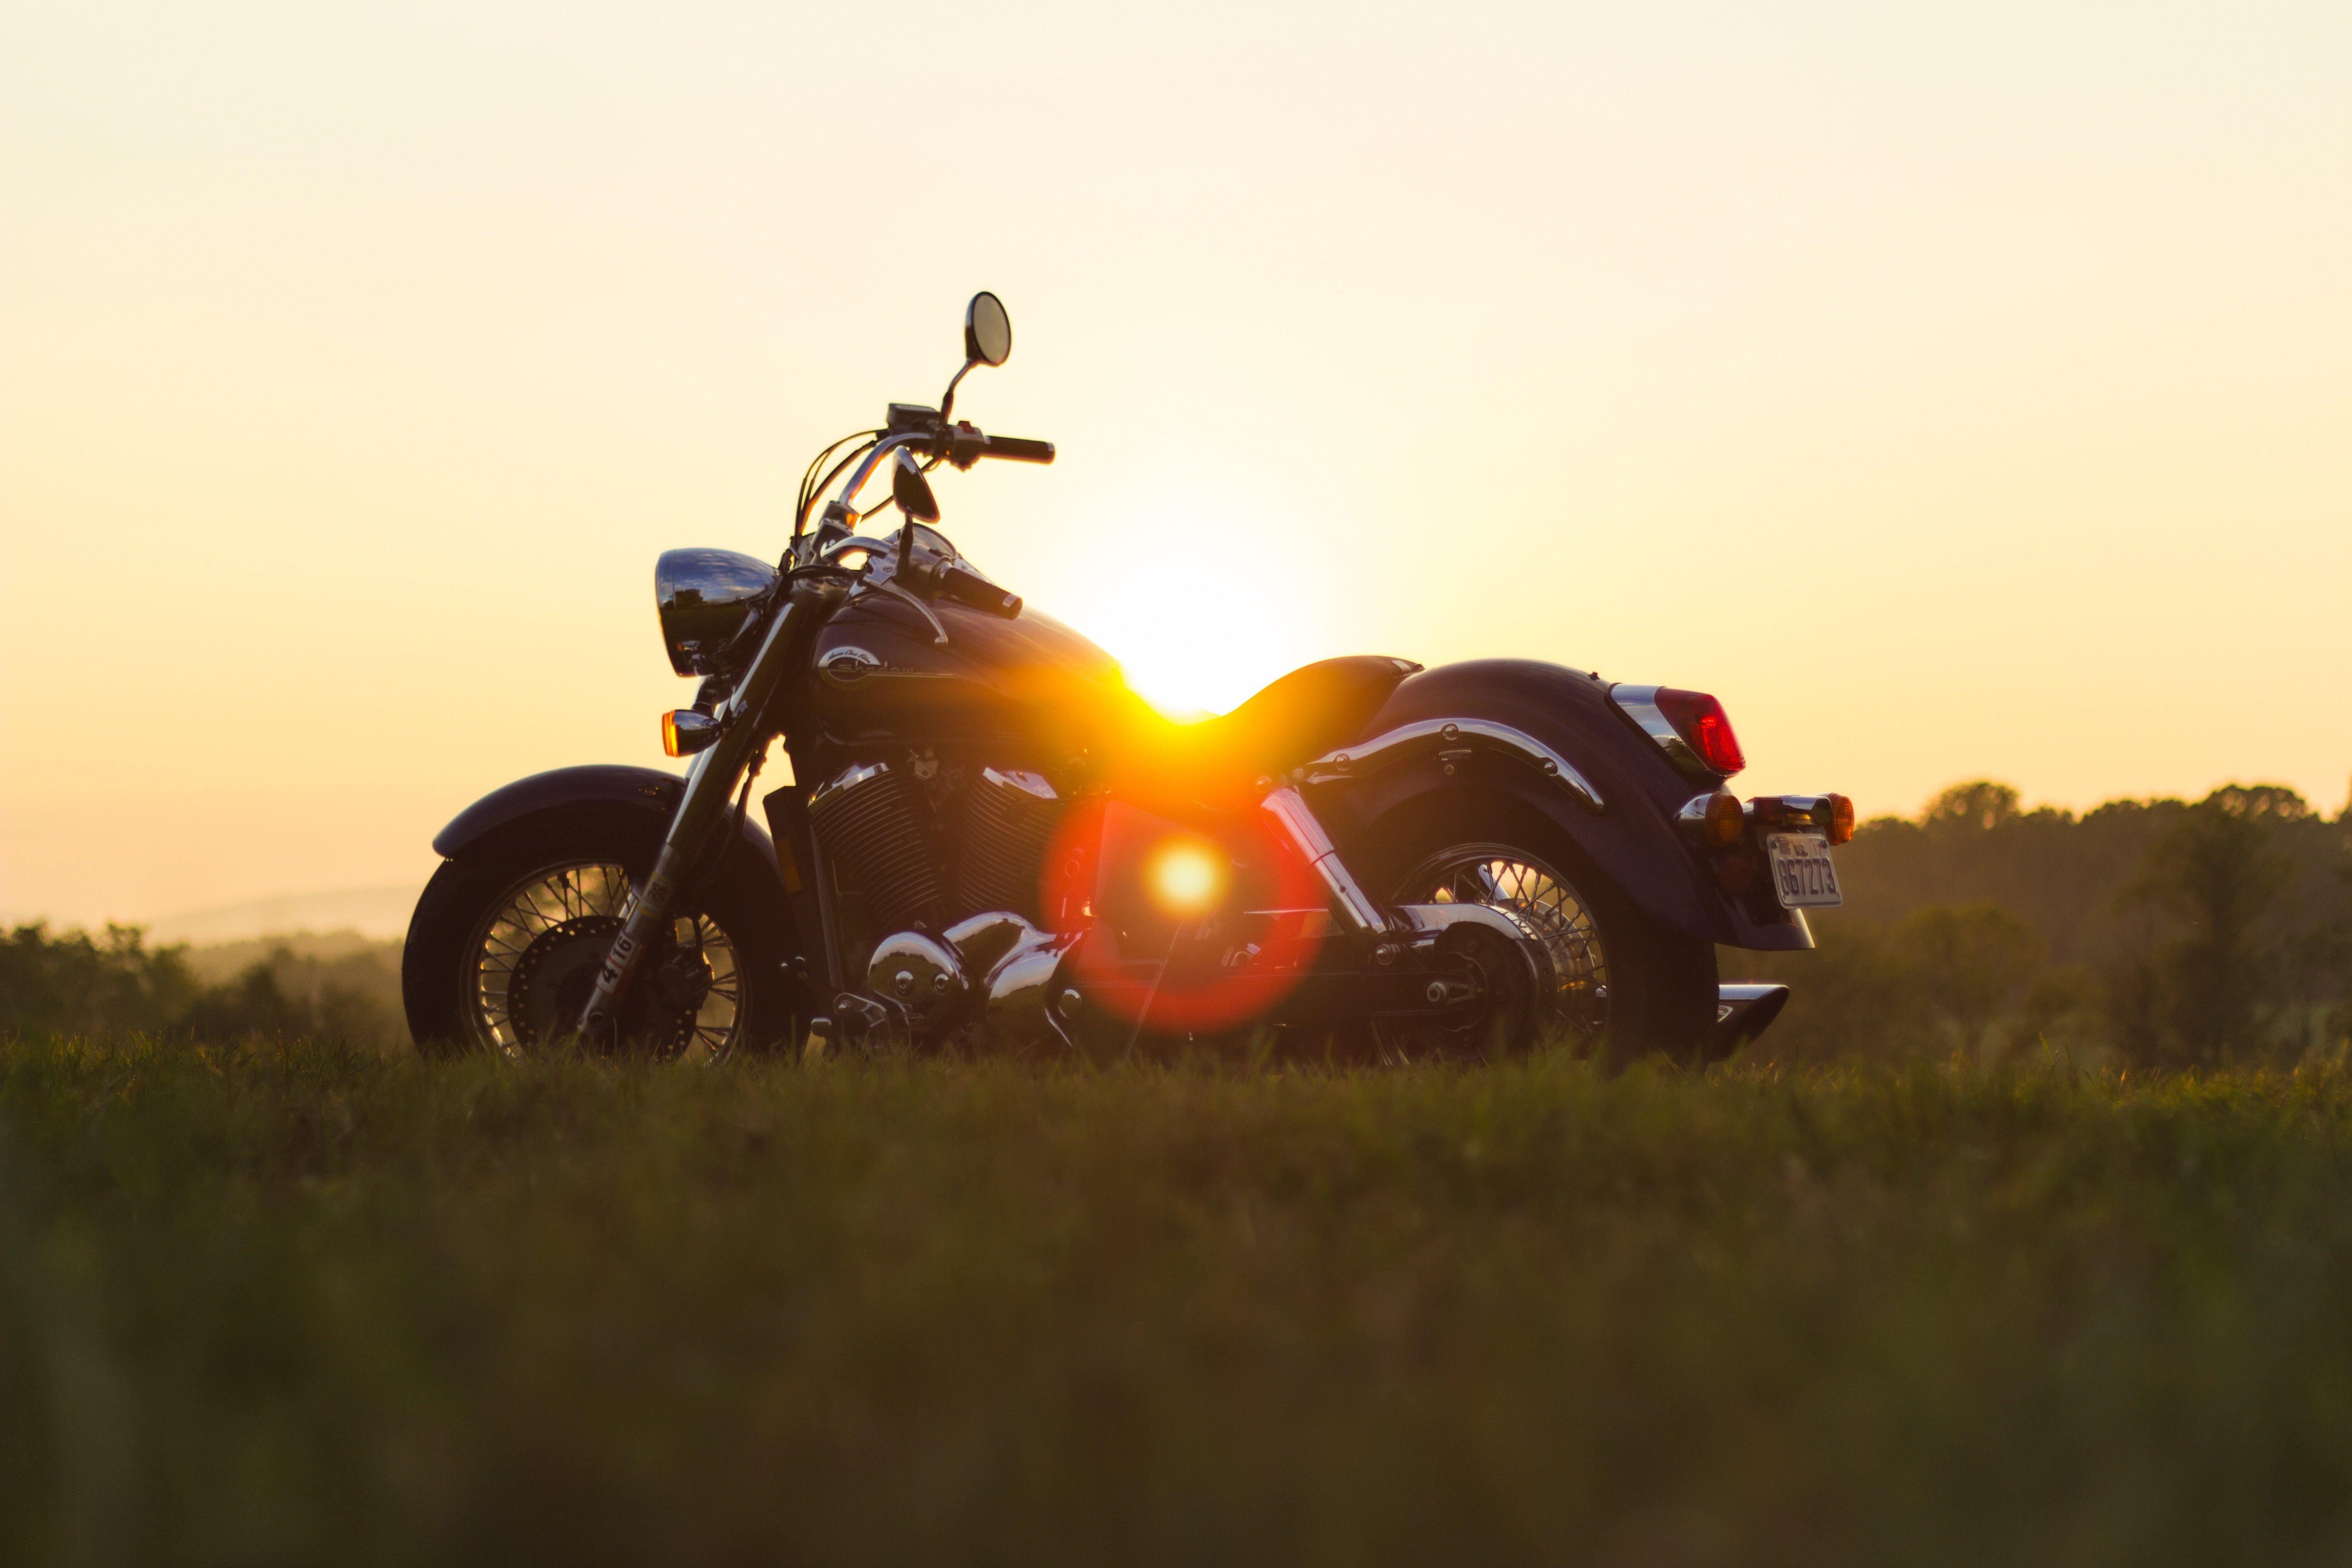 motorcycle-outside-grass.jpg